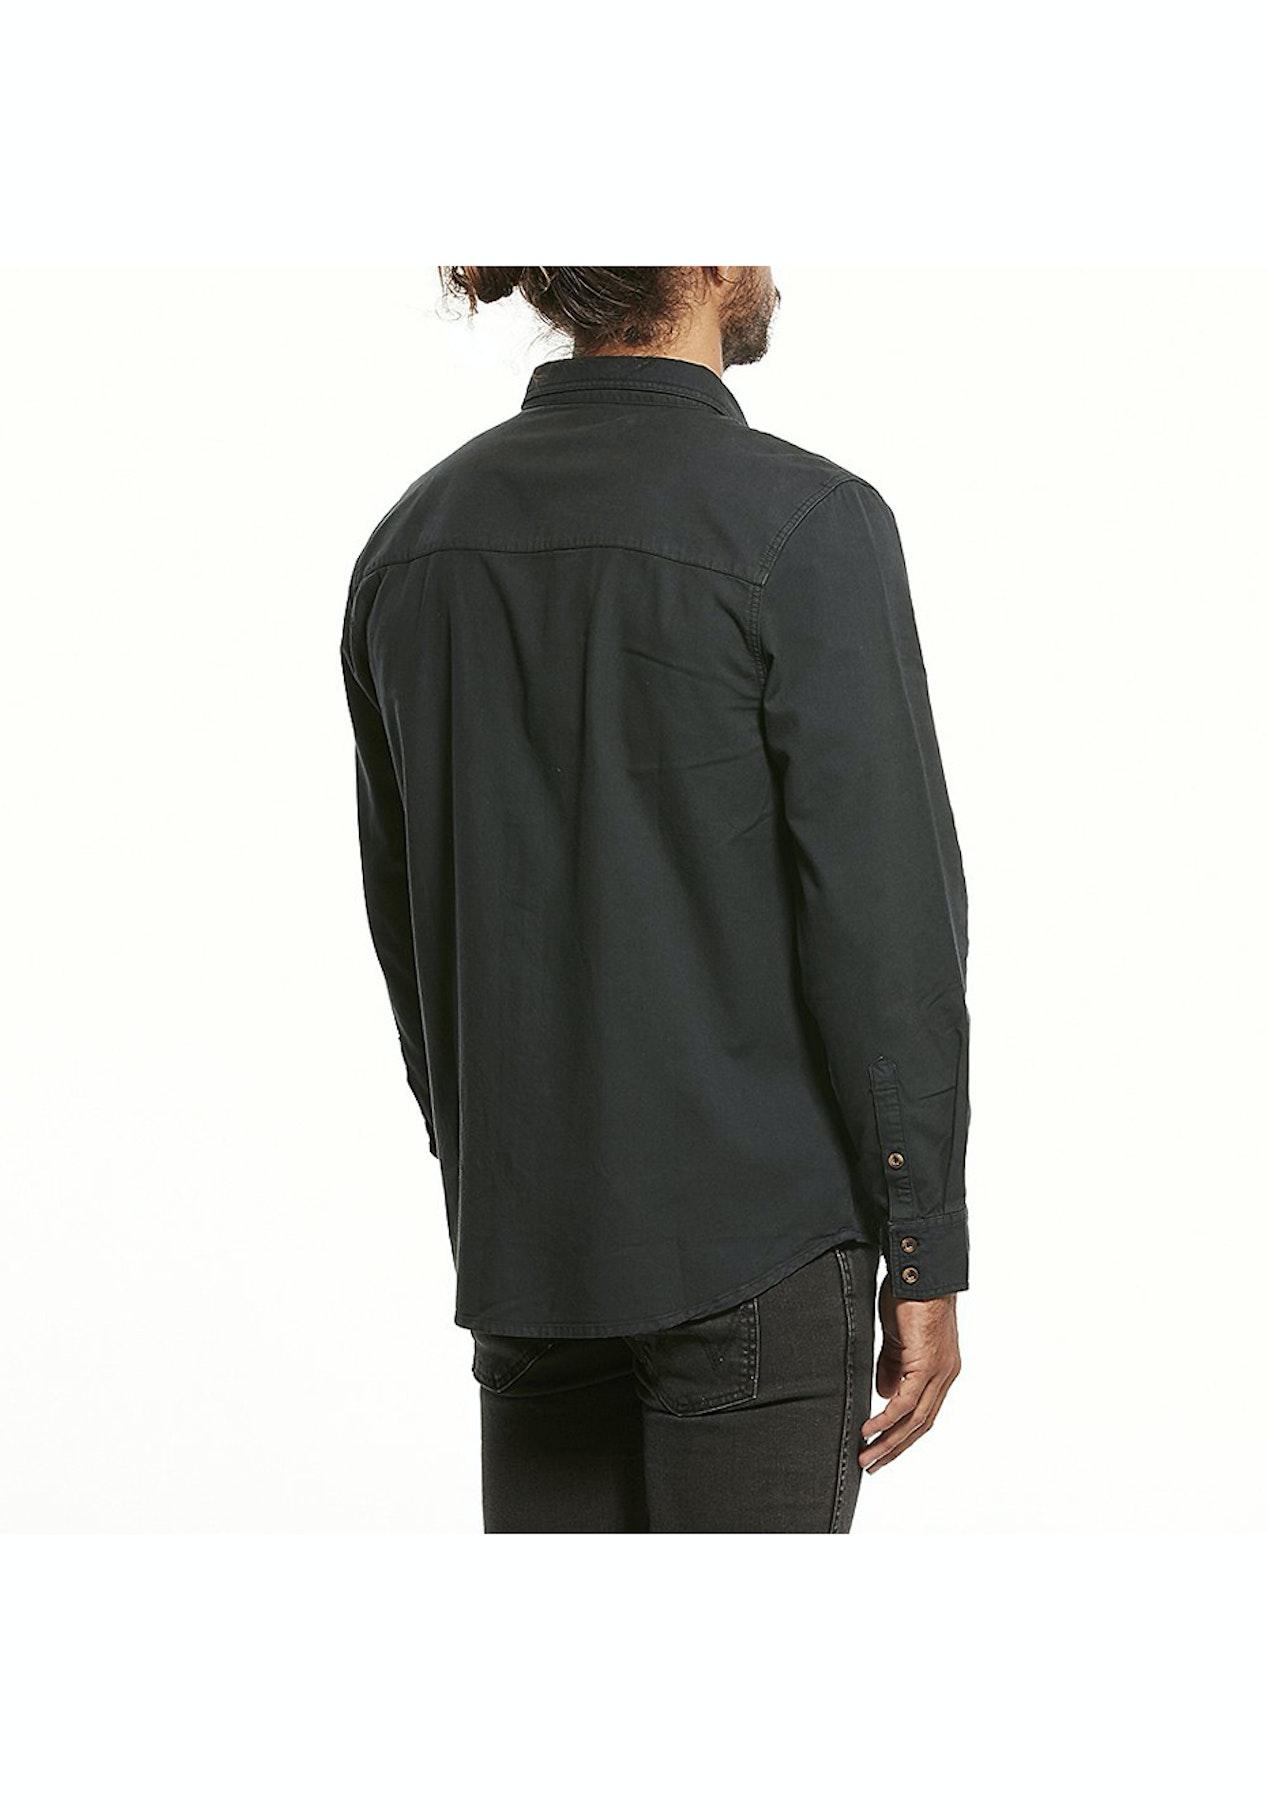 ccff3167b1422 Wrangler - Platoon Ls Shirt - Vintage Black - Wrangler   Lee Mens ...